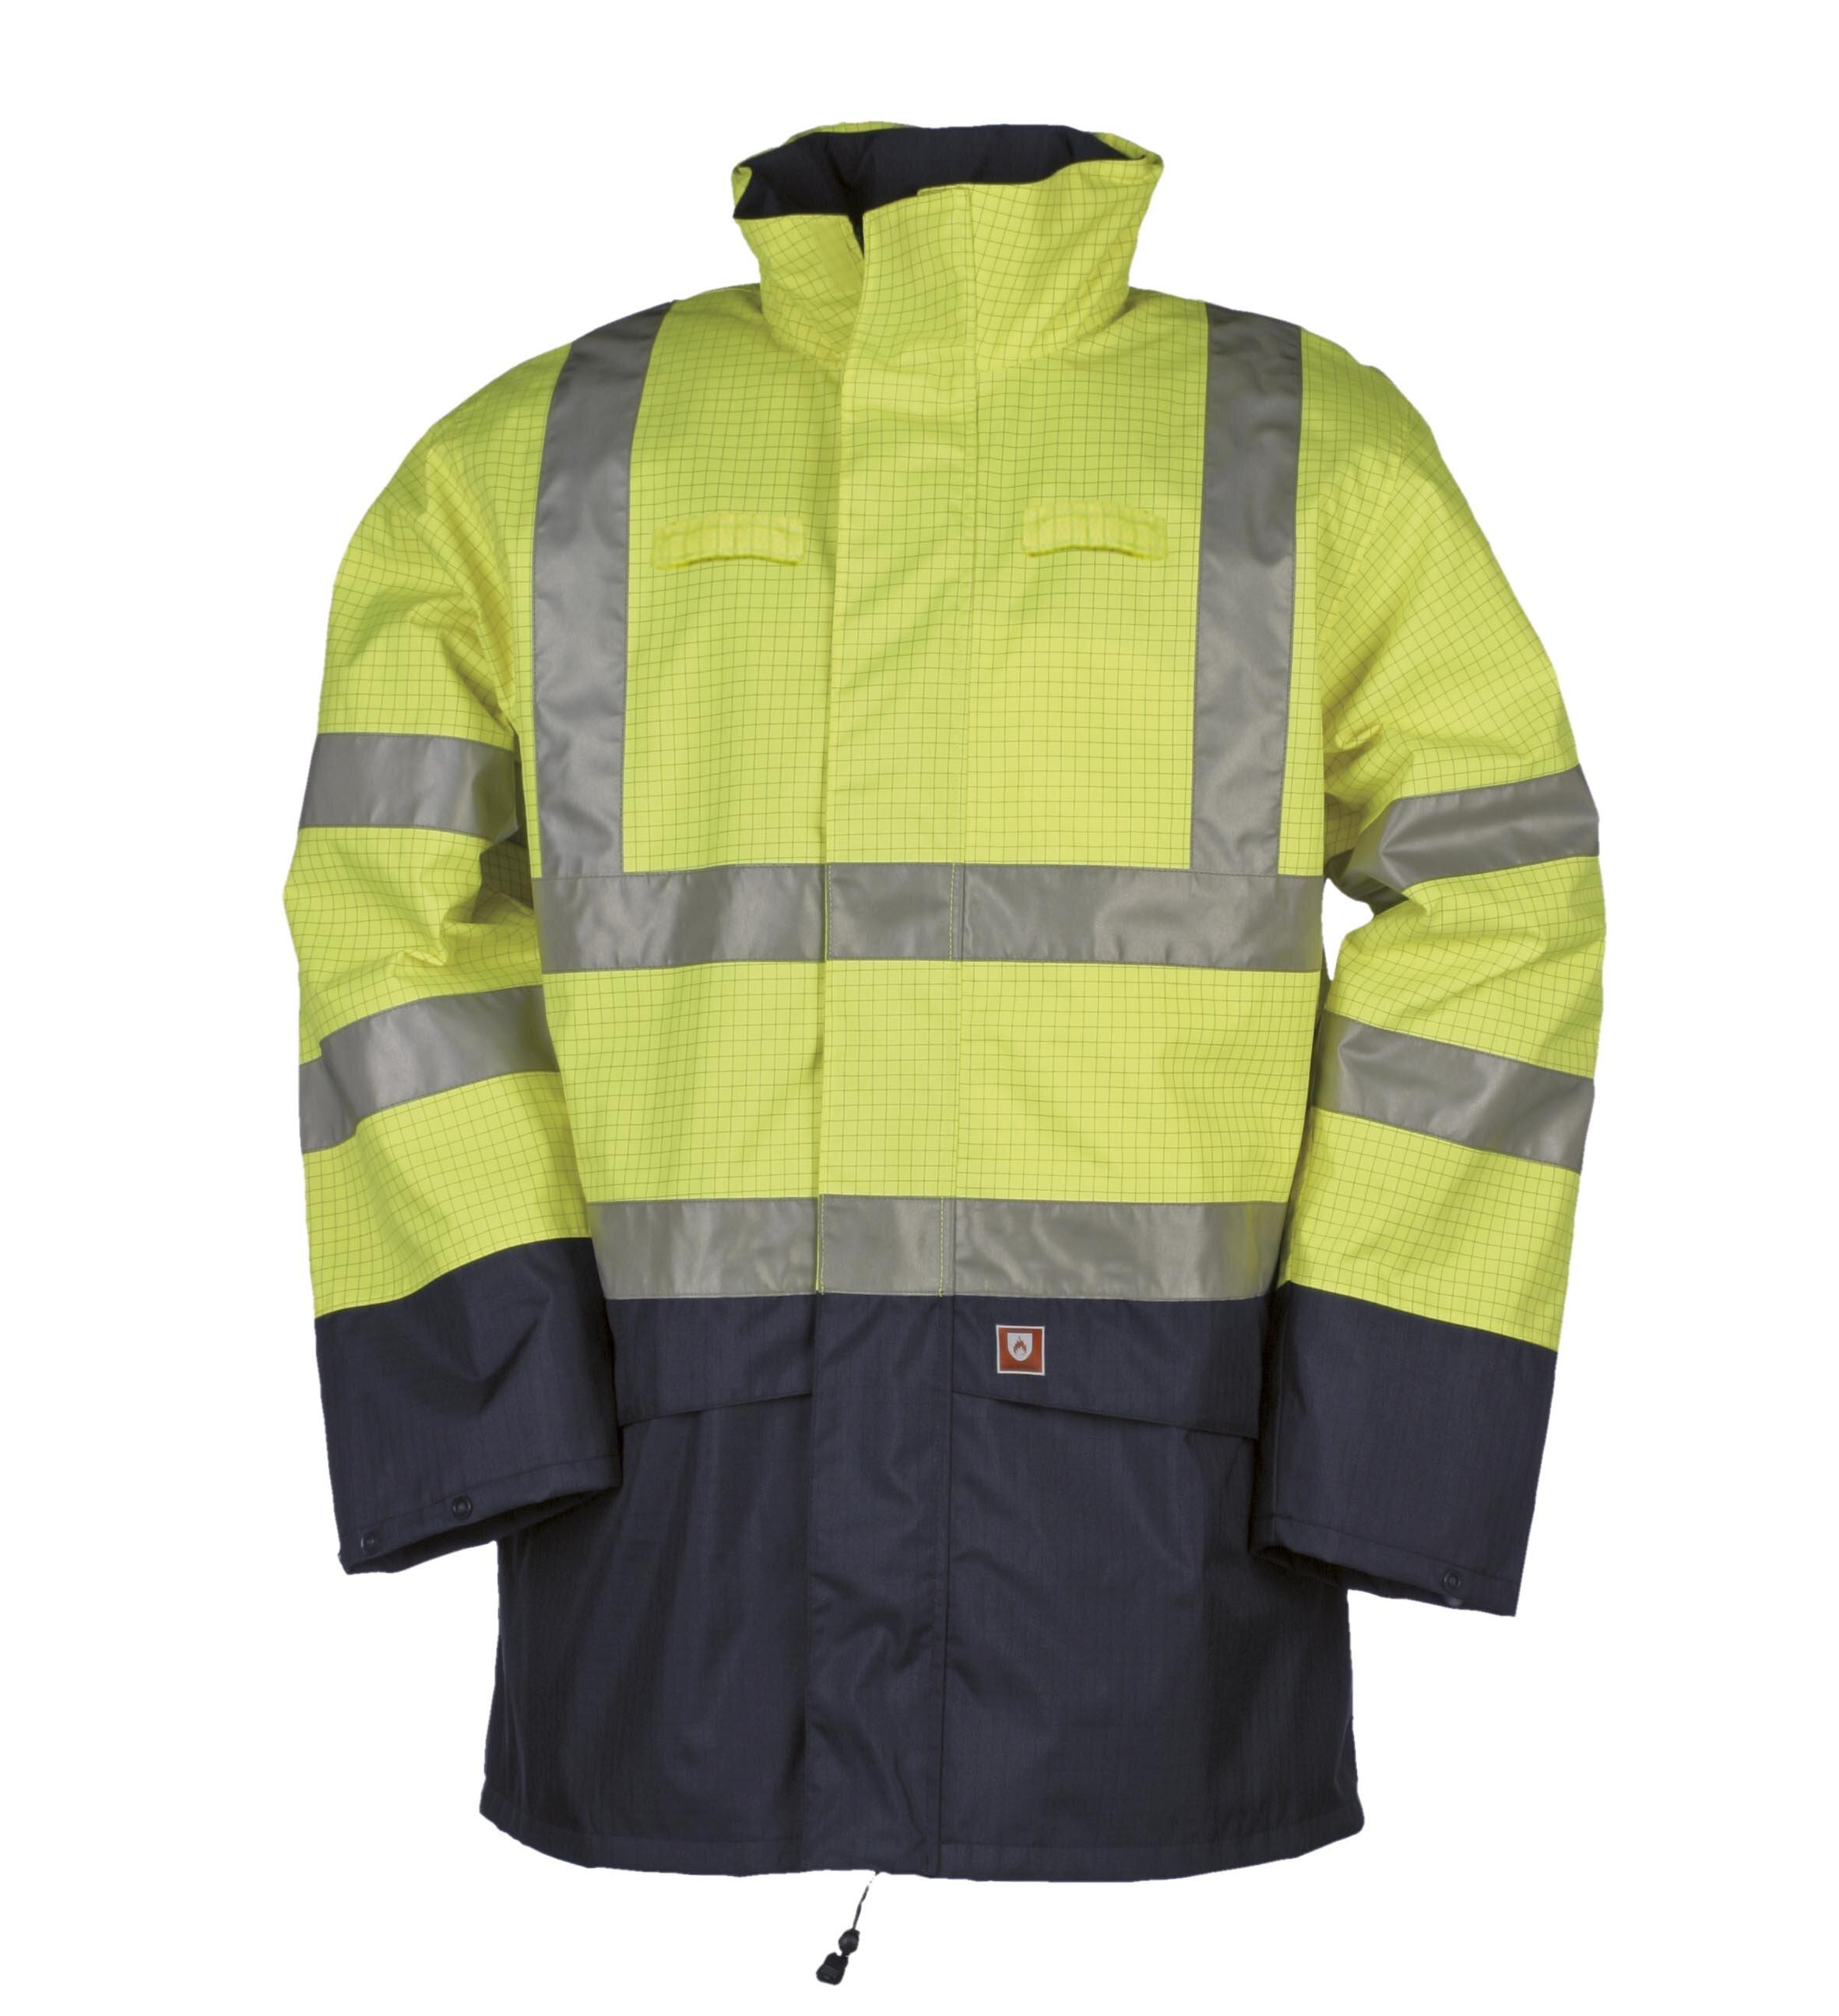 SIOEN 9464 Hi-Vis FR AST Jacket with Detachable Lining